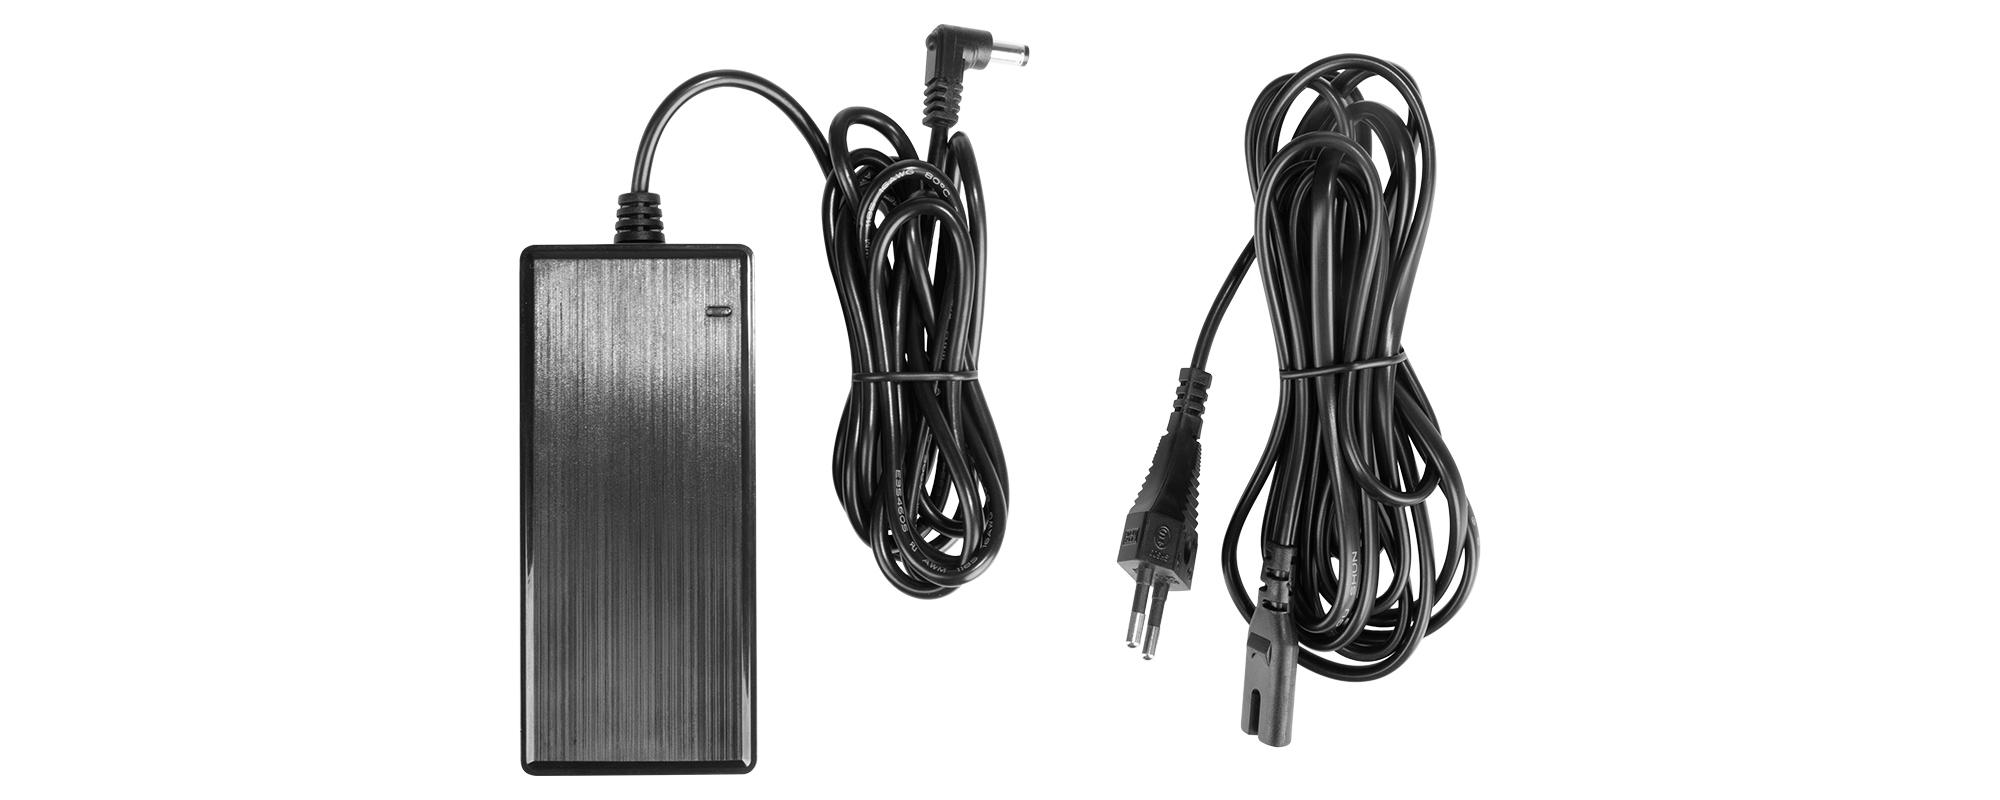 Zestaw 4 lamp LED Aputure MC Travel Kit - zestaw w walizce